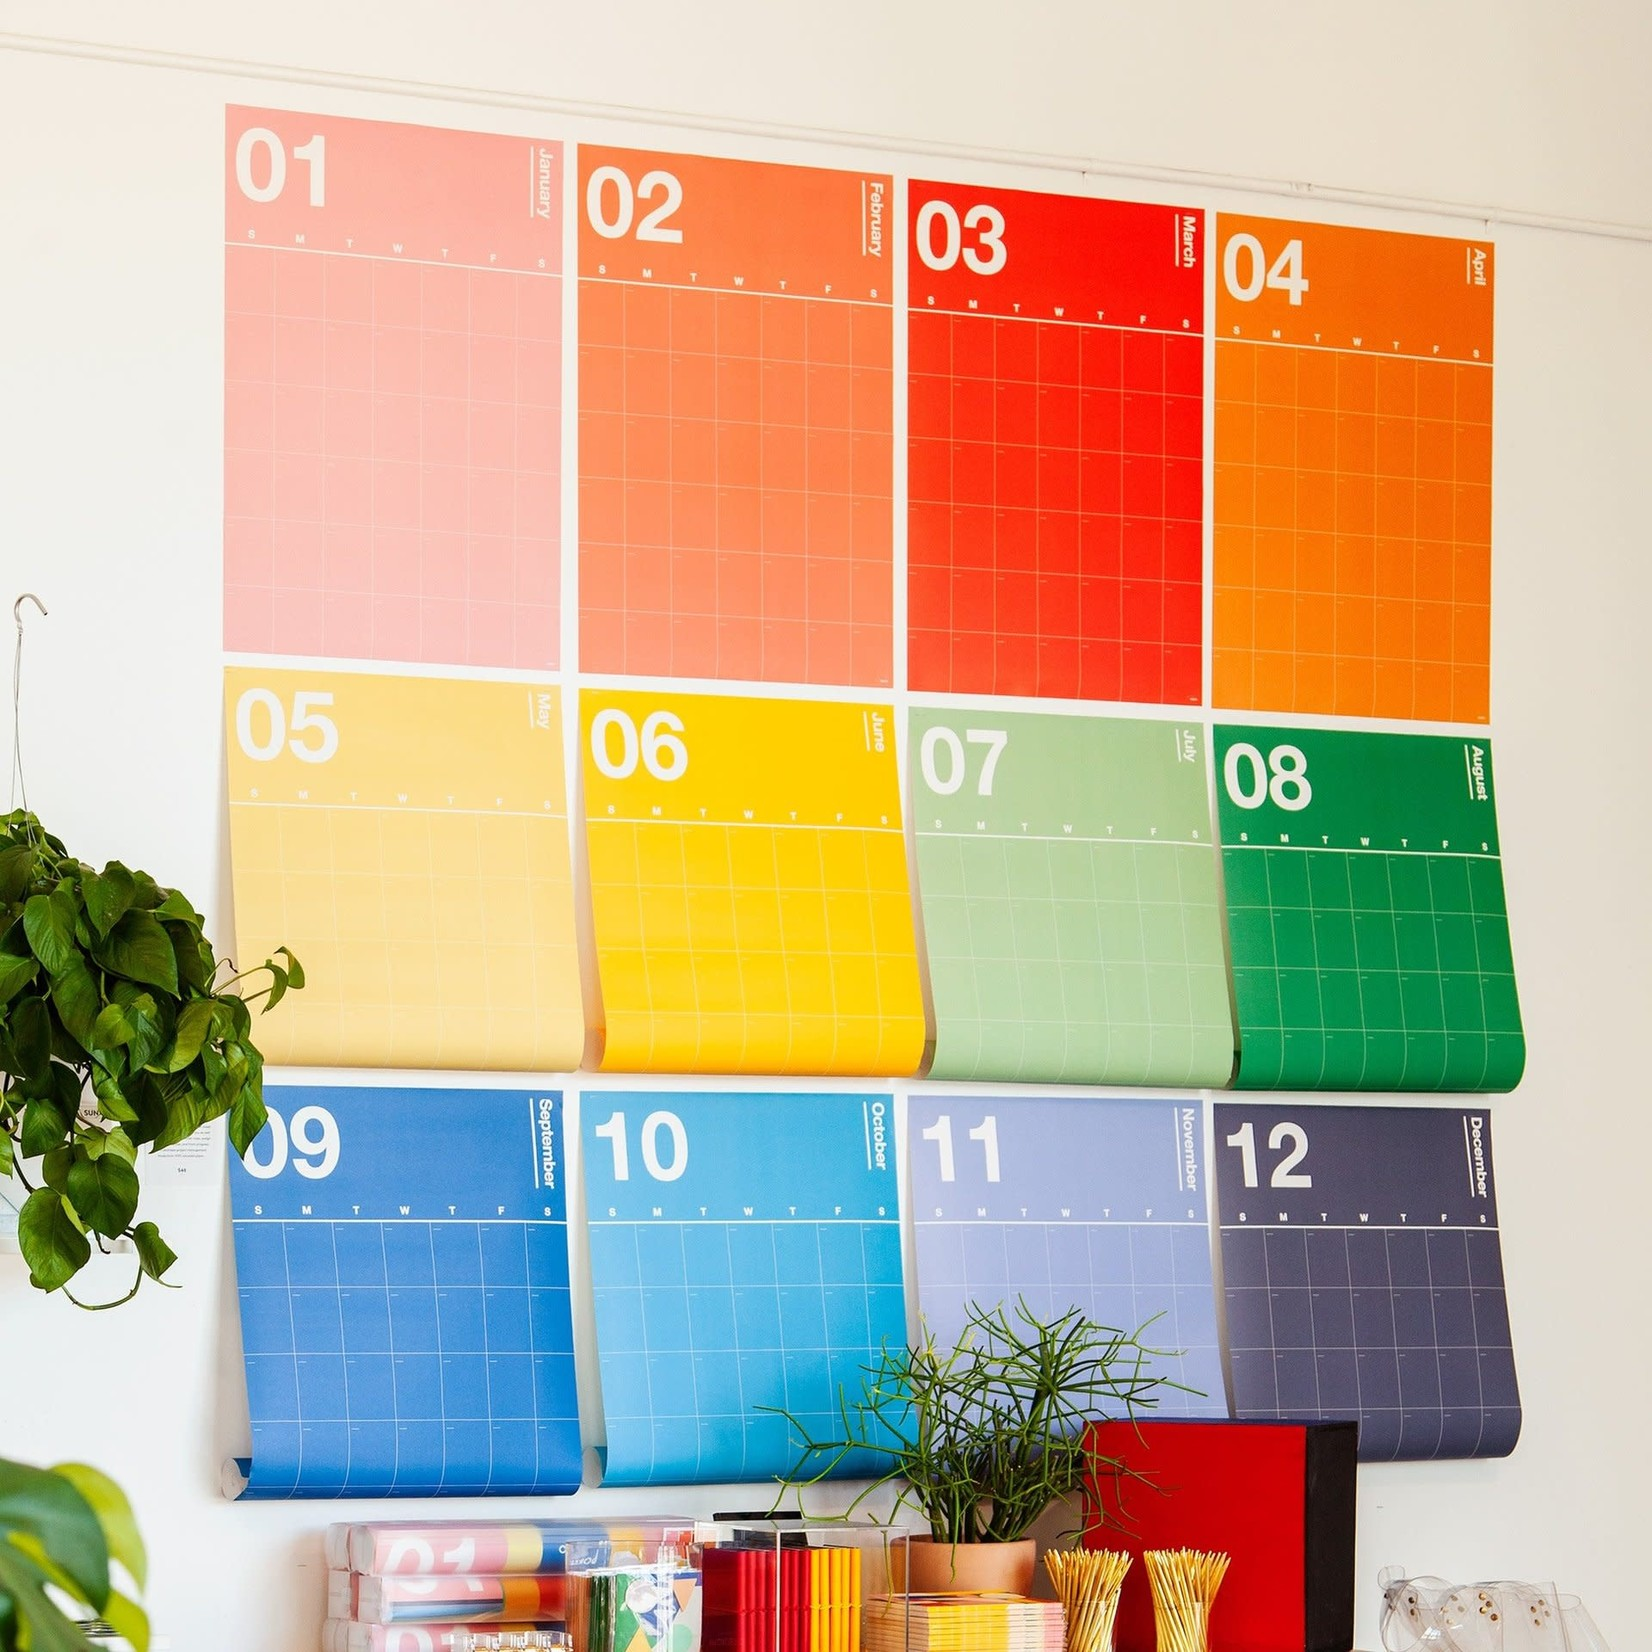 Poketo Spectrum Wall Planner